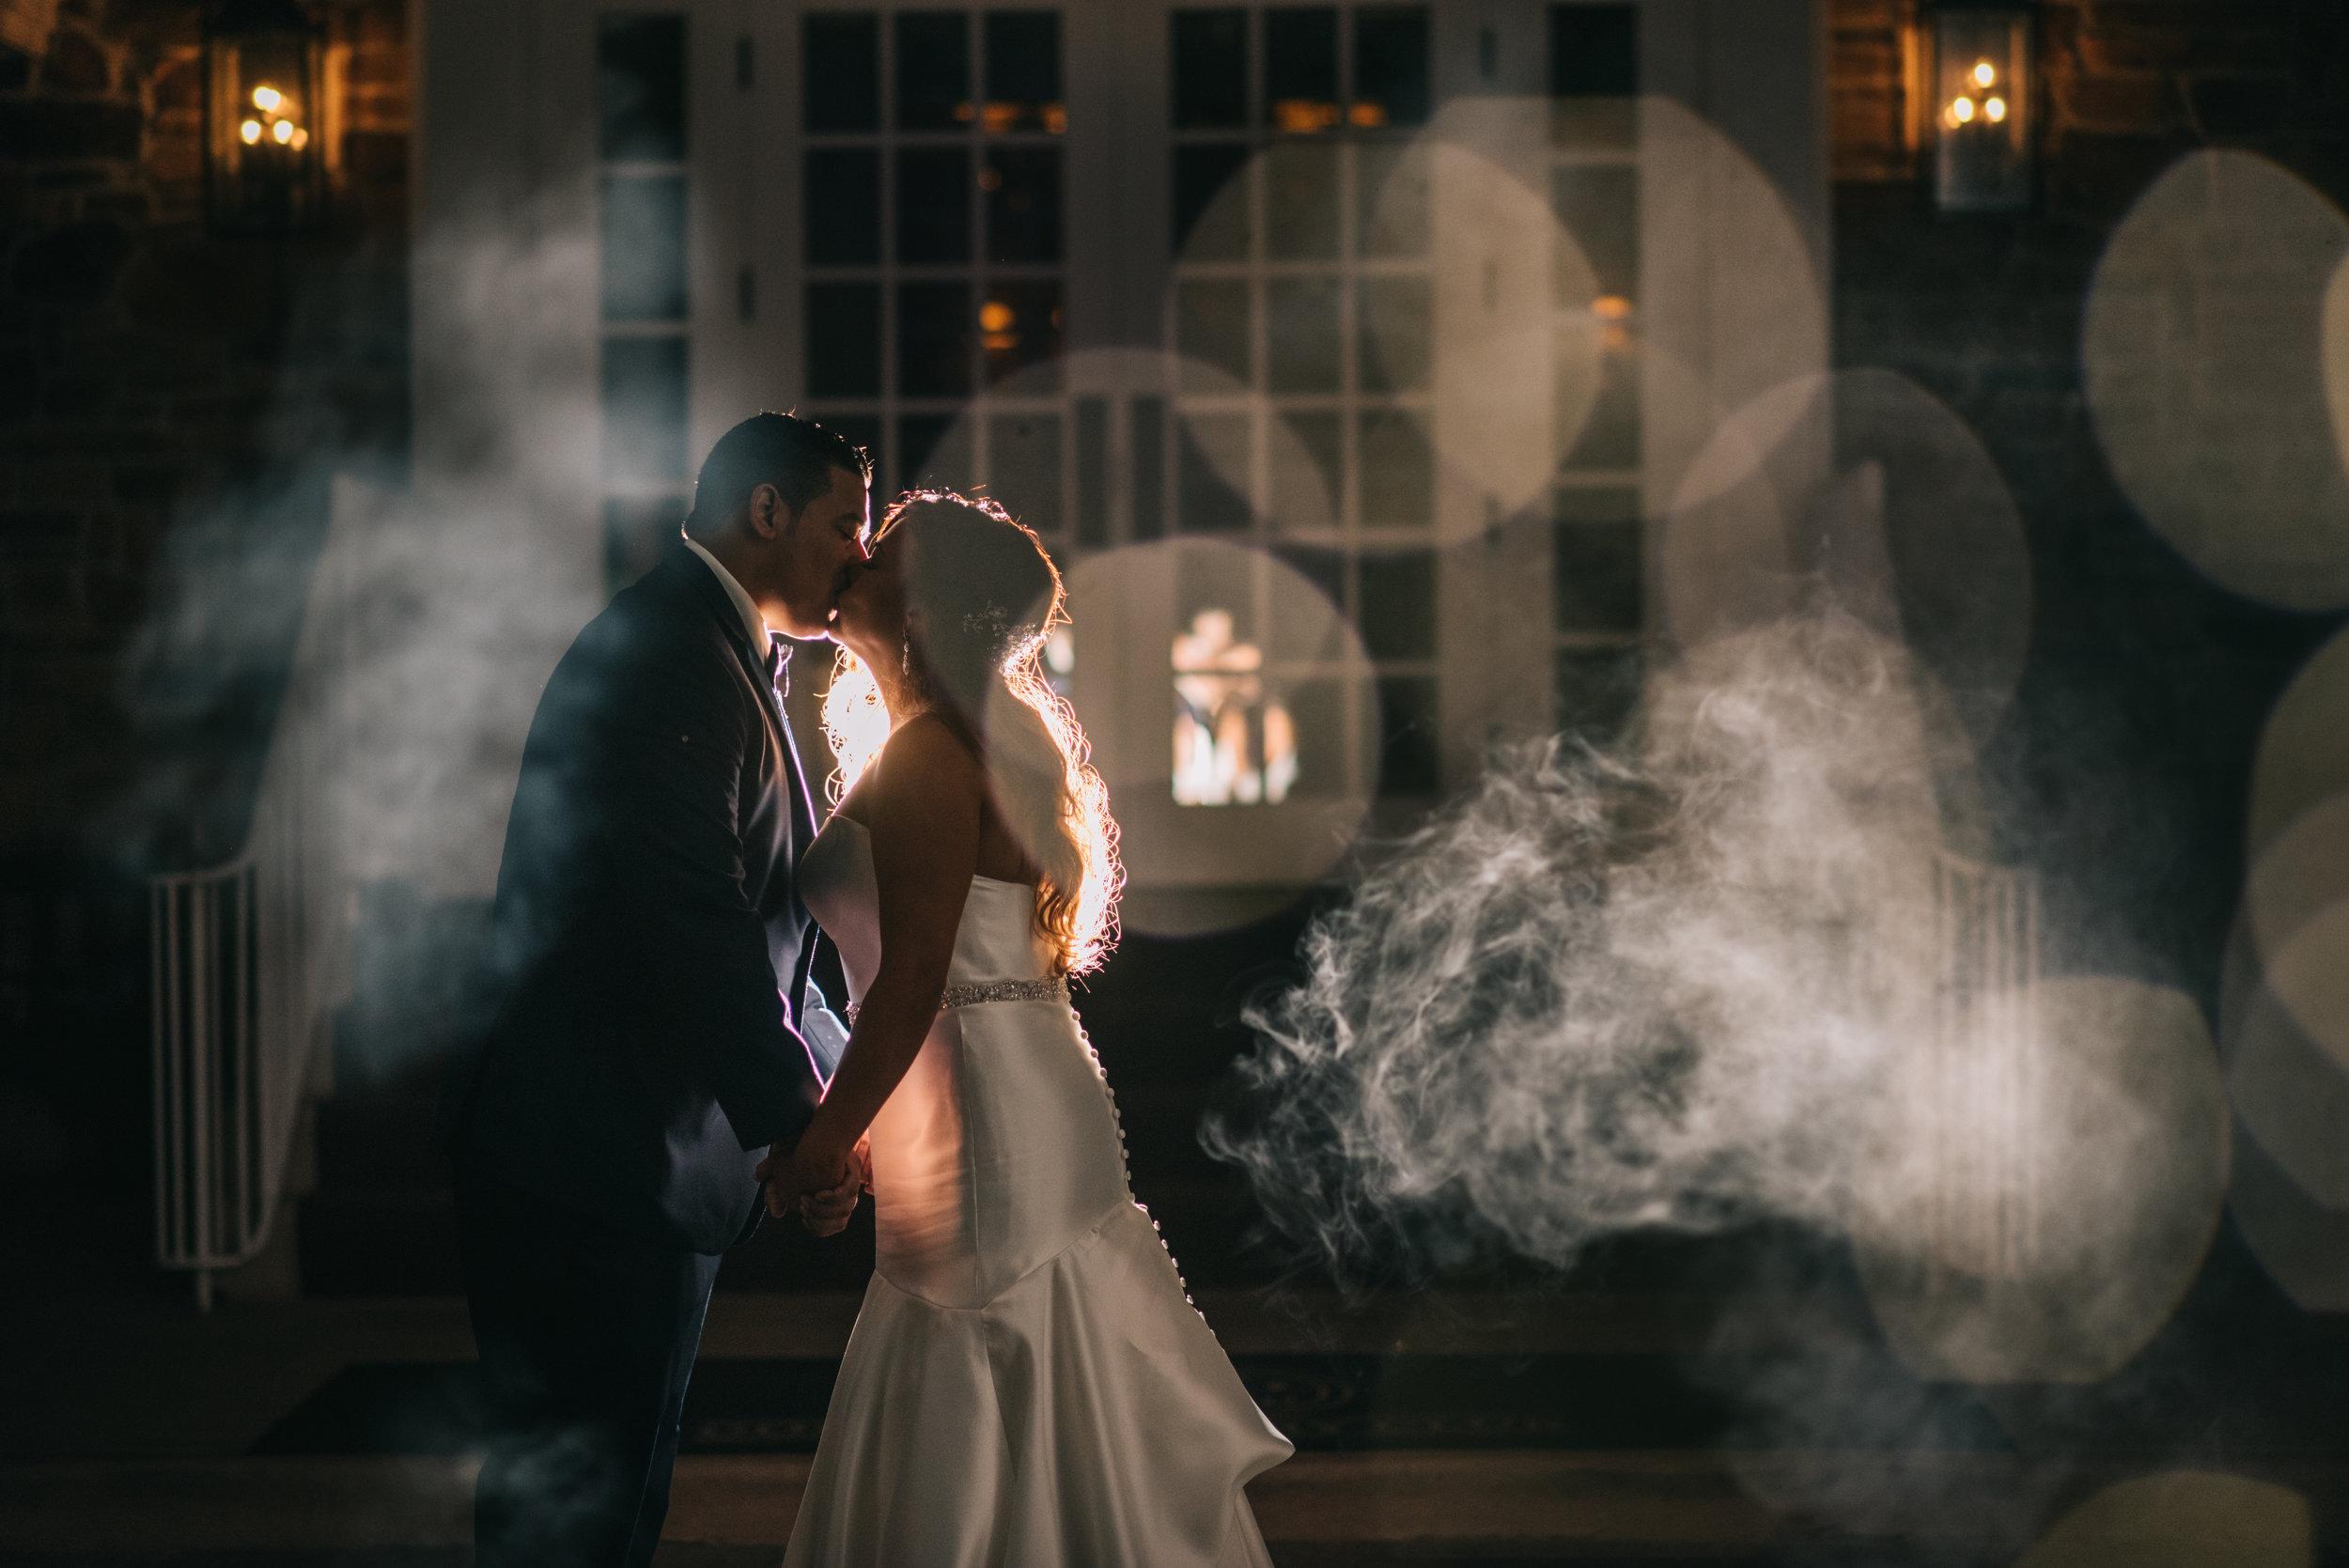 WeddingPhotos | NJPhotographer | Highlights-6-26.jpg